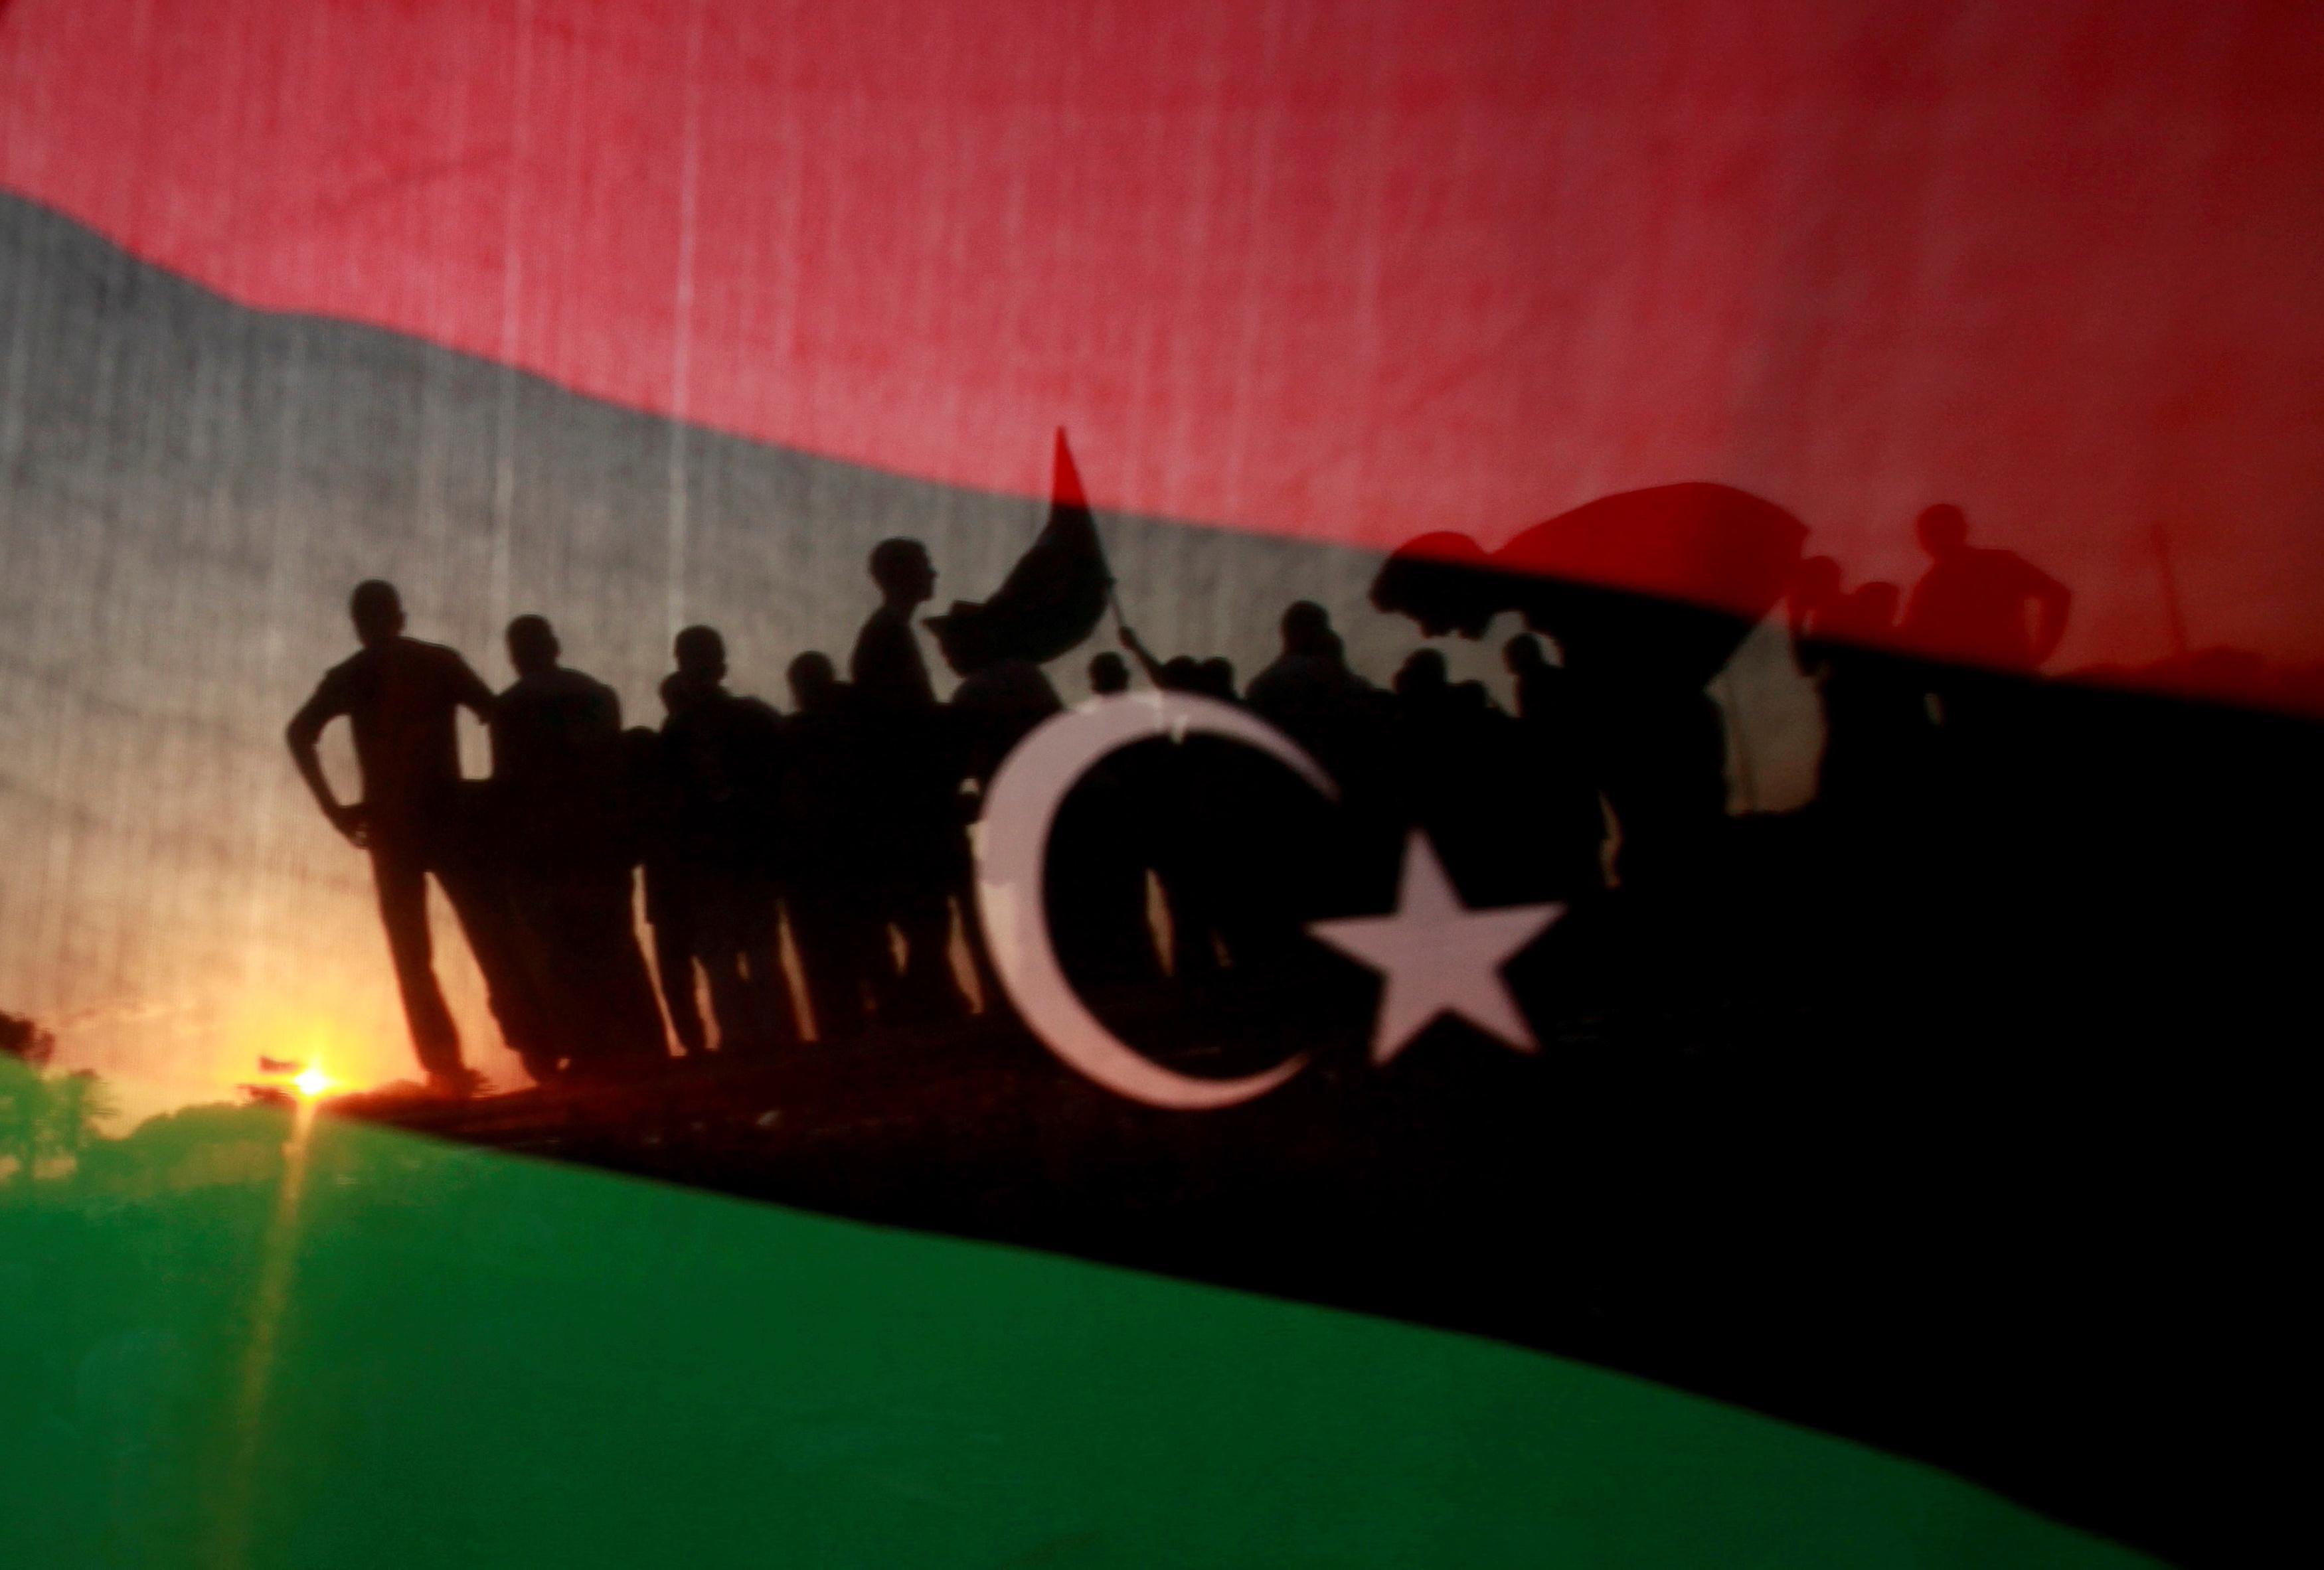 What We're Watching: Libya's future, Russia vs UK in Black Sea, US blocks Iranian news sites